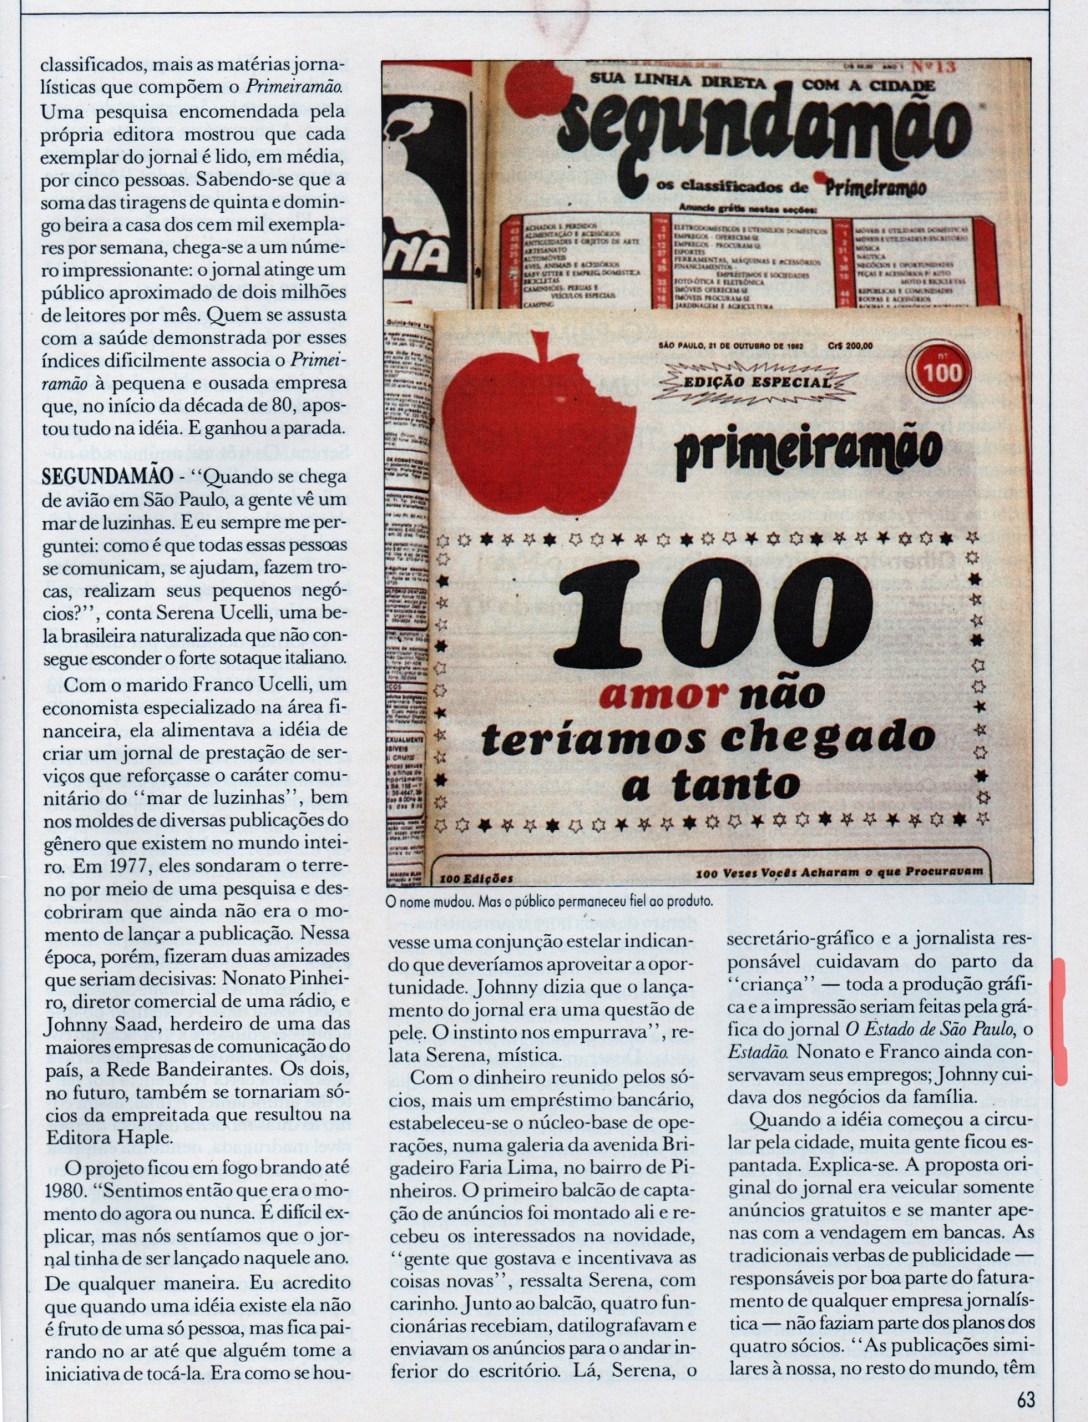 1989-02 Jornal Pequenas empresas grandes negocios 3